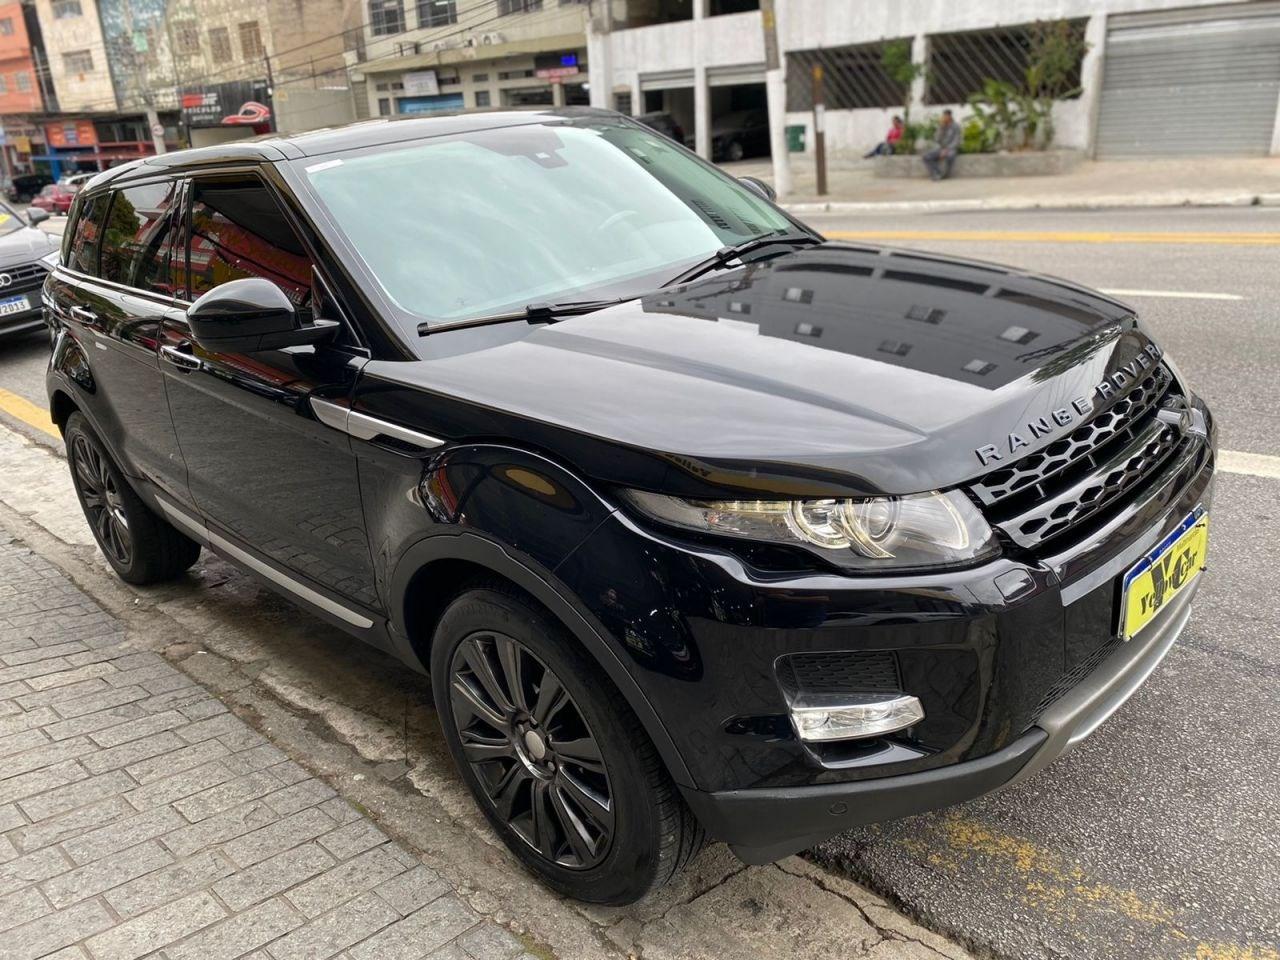 //www.autoline.com.br/carro/land-rover/range-rover-evoque-22-prestige-tech-pack-16v-diesel-4p-4x4-turbo/2015/sao-paulo-sp/15693478